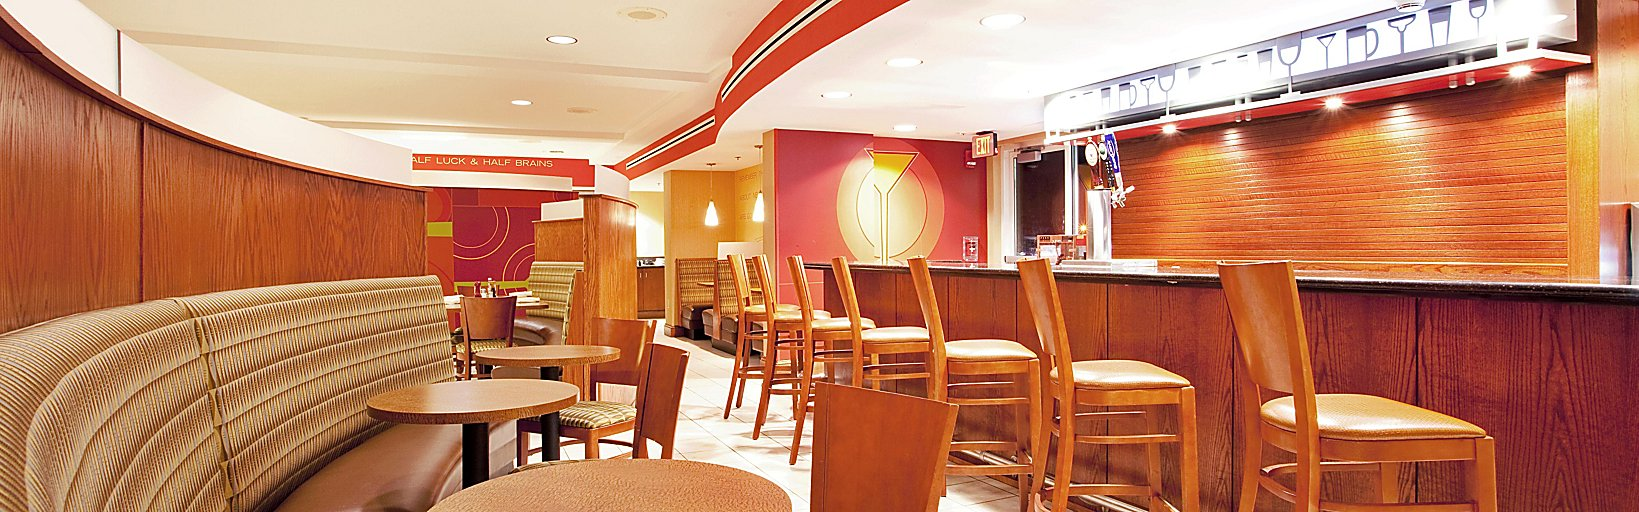 Restaurants Near Holiday Inn Hotel & Suites Beckley